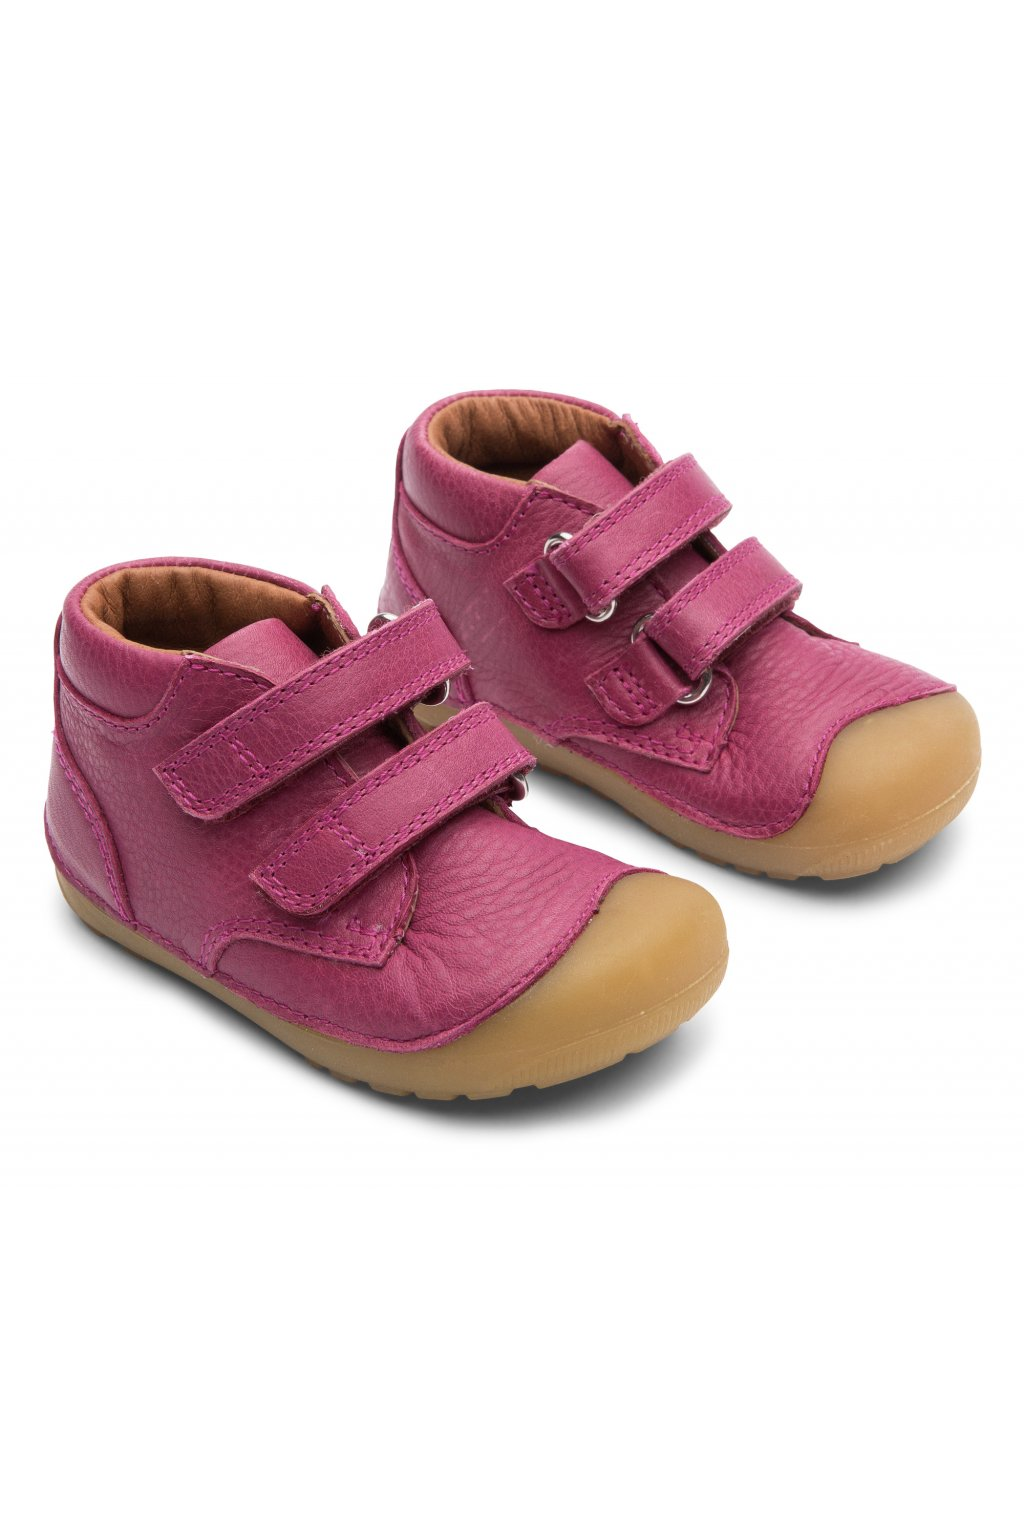 Bundgaard Petit Velcro - Rosewine